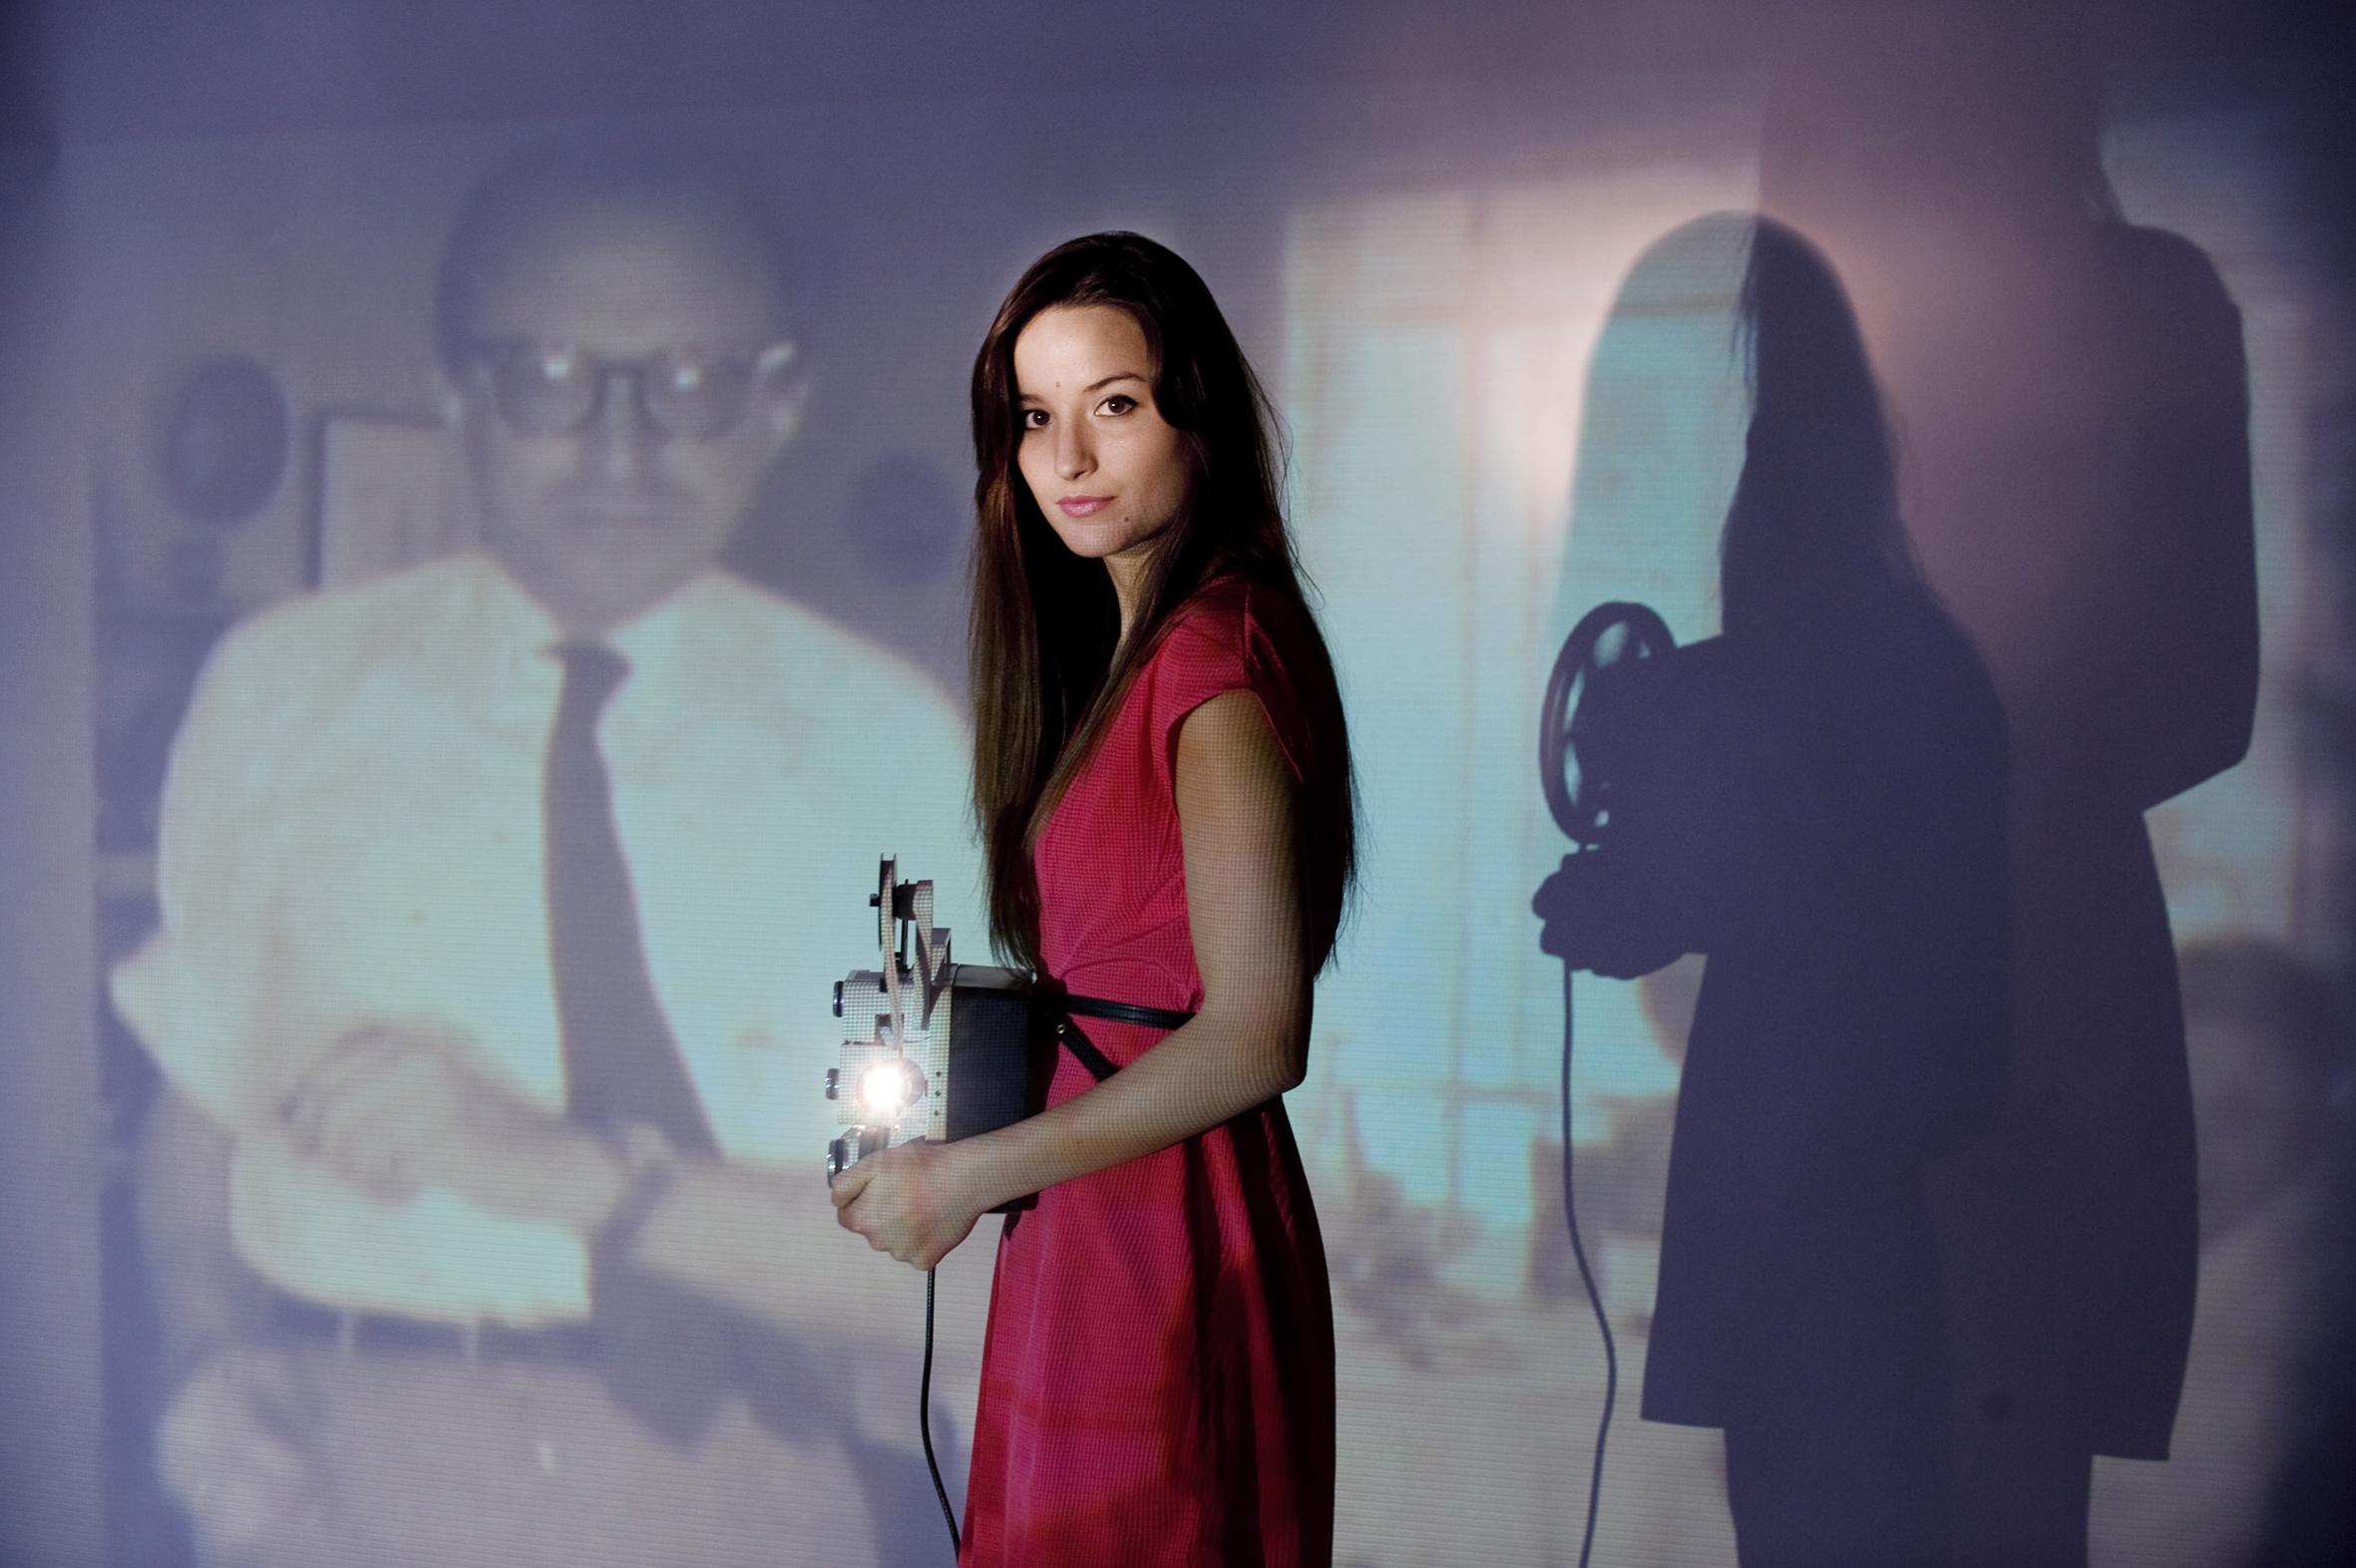 Judit Neddermann canta a Pere Calders